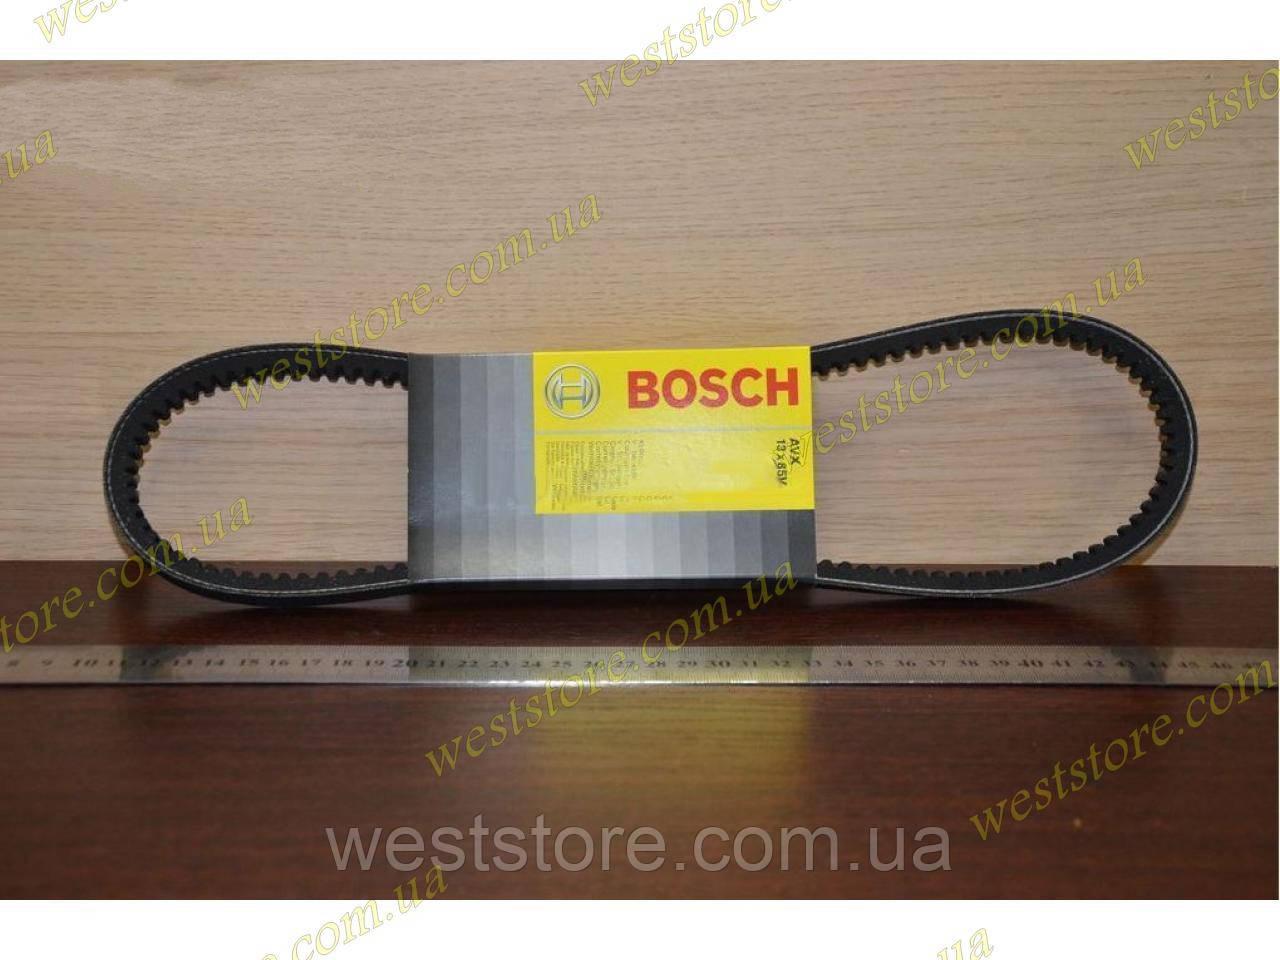 Ремень кондиционера Ланос Lanos (13х850) зубчатый Bosch (Бош)1987947651 \96486814